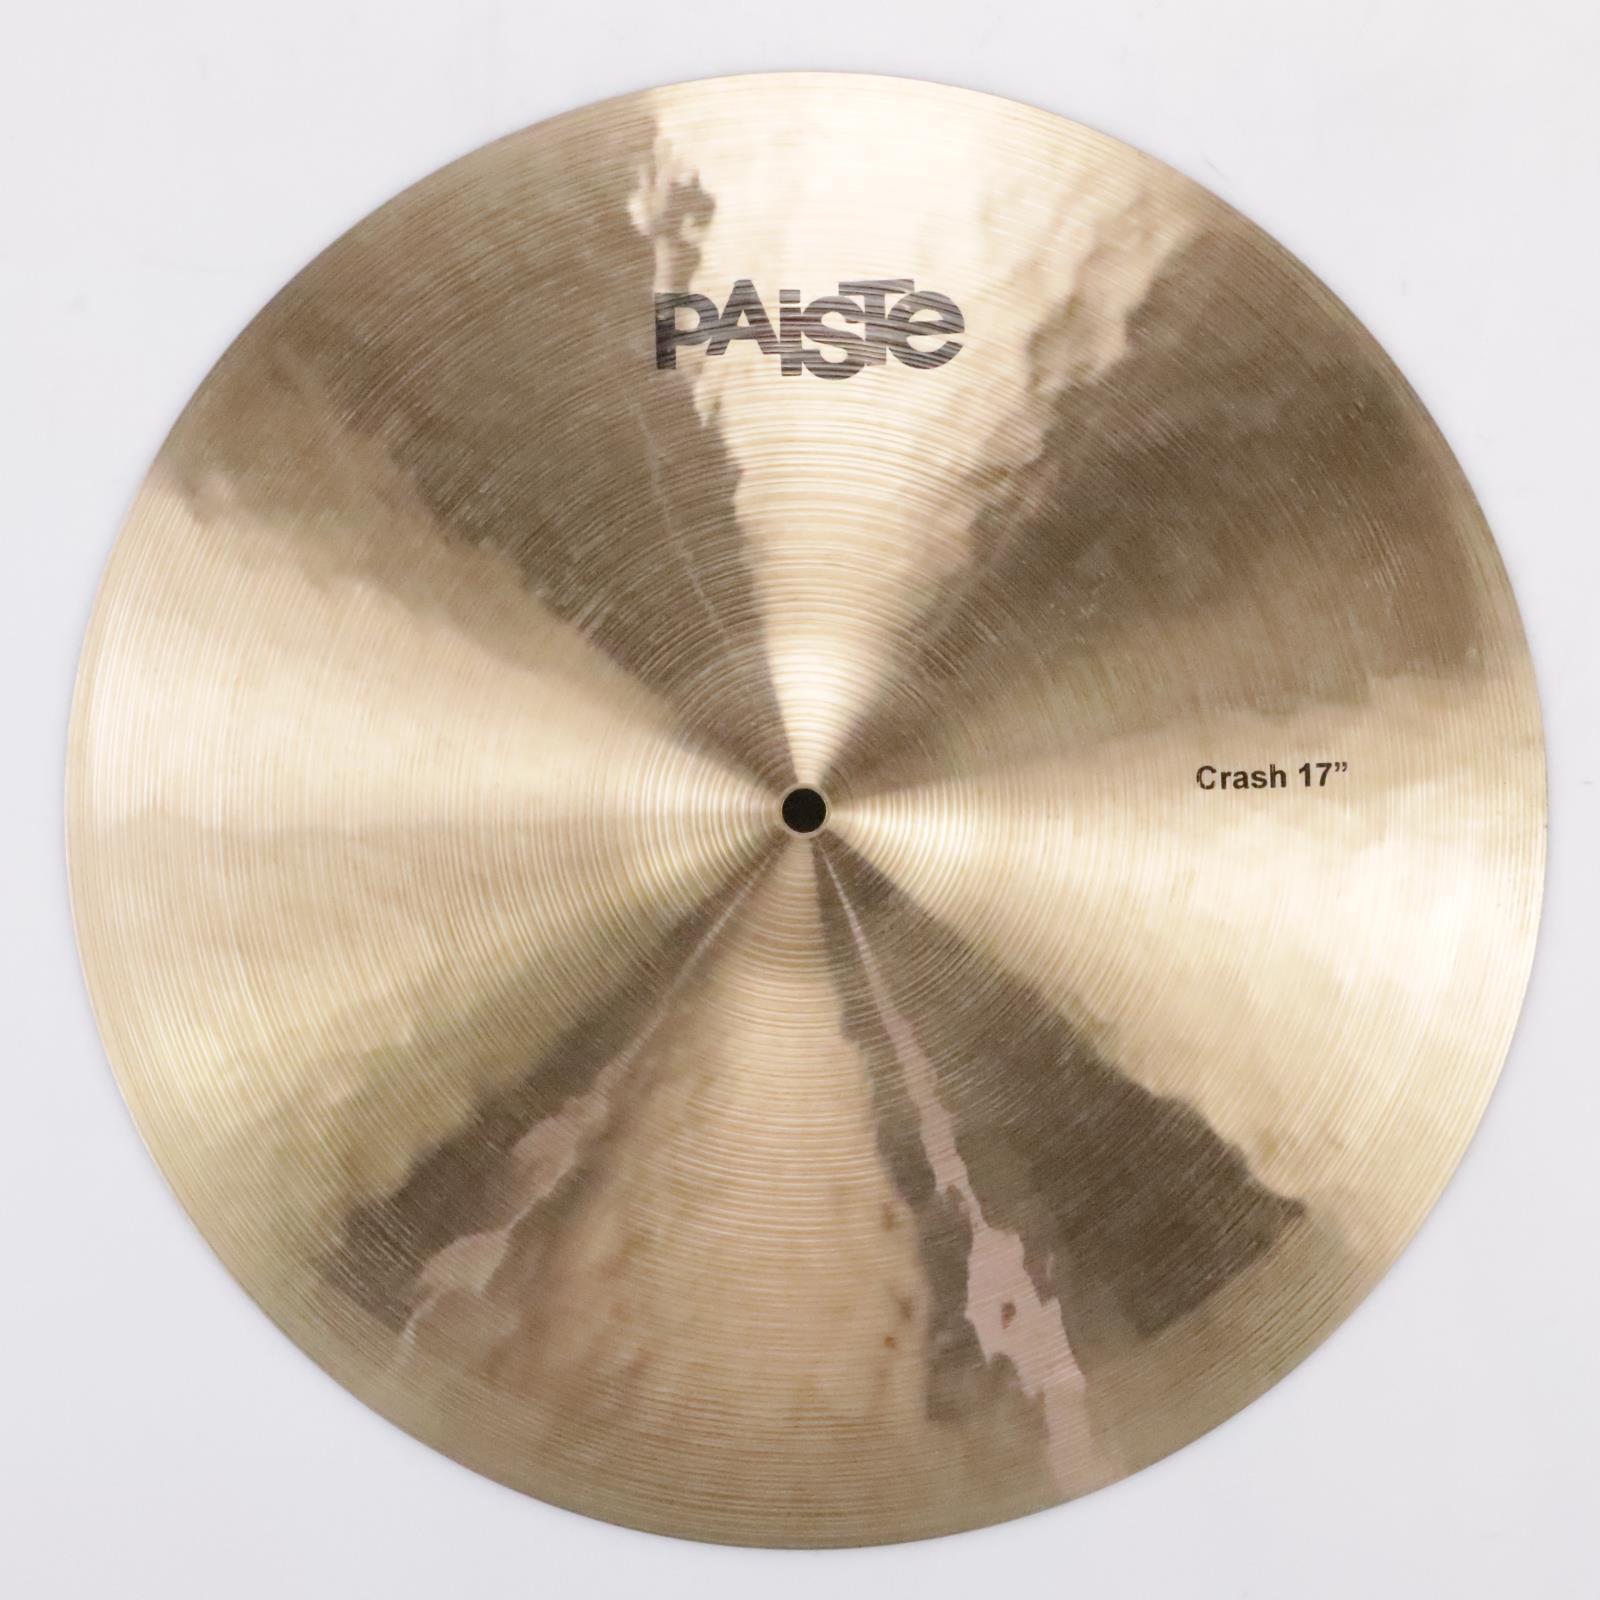 "Paiste 17"" Prototype Crash Cymbal #35758"